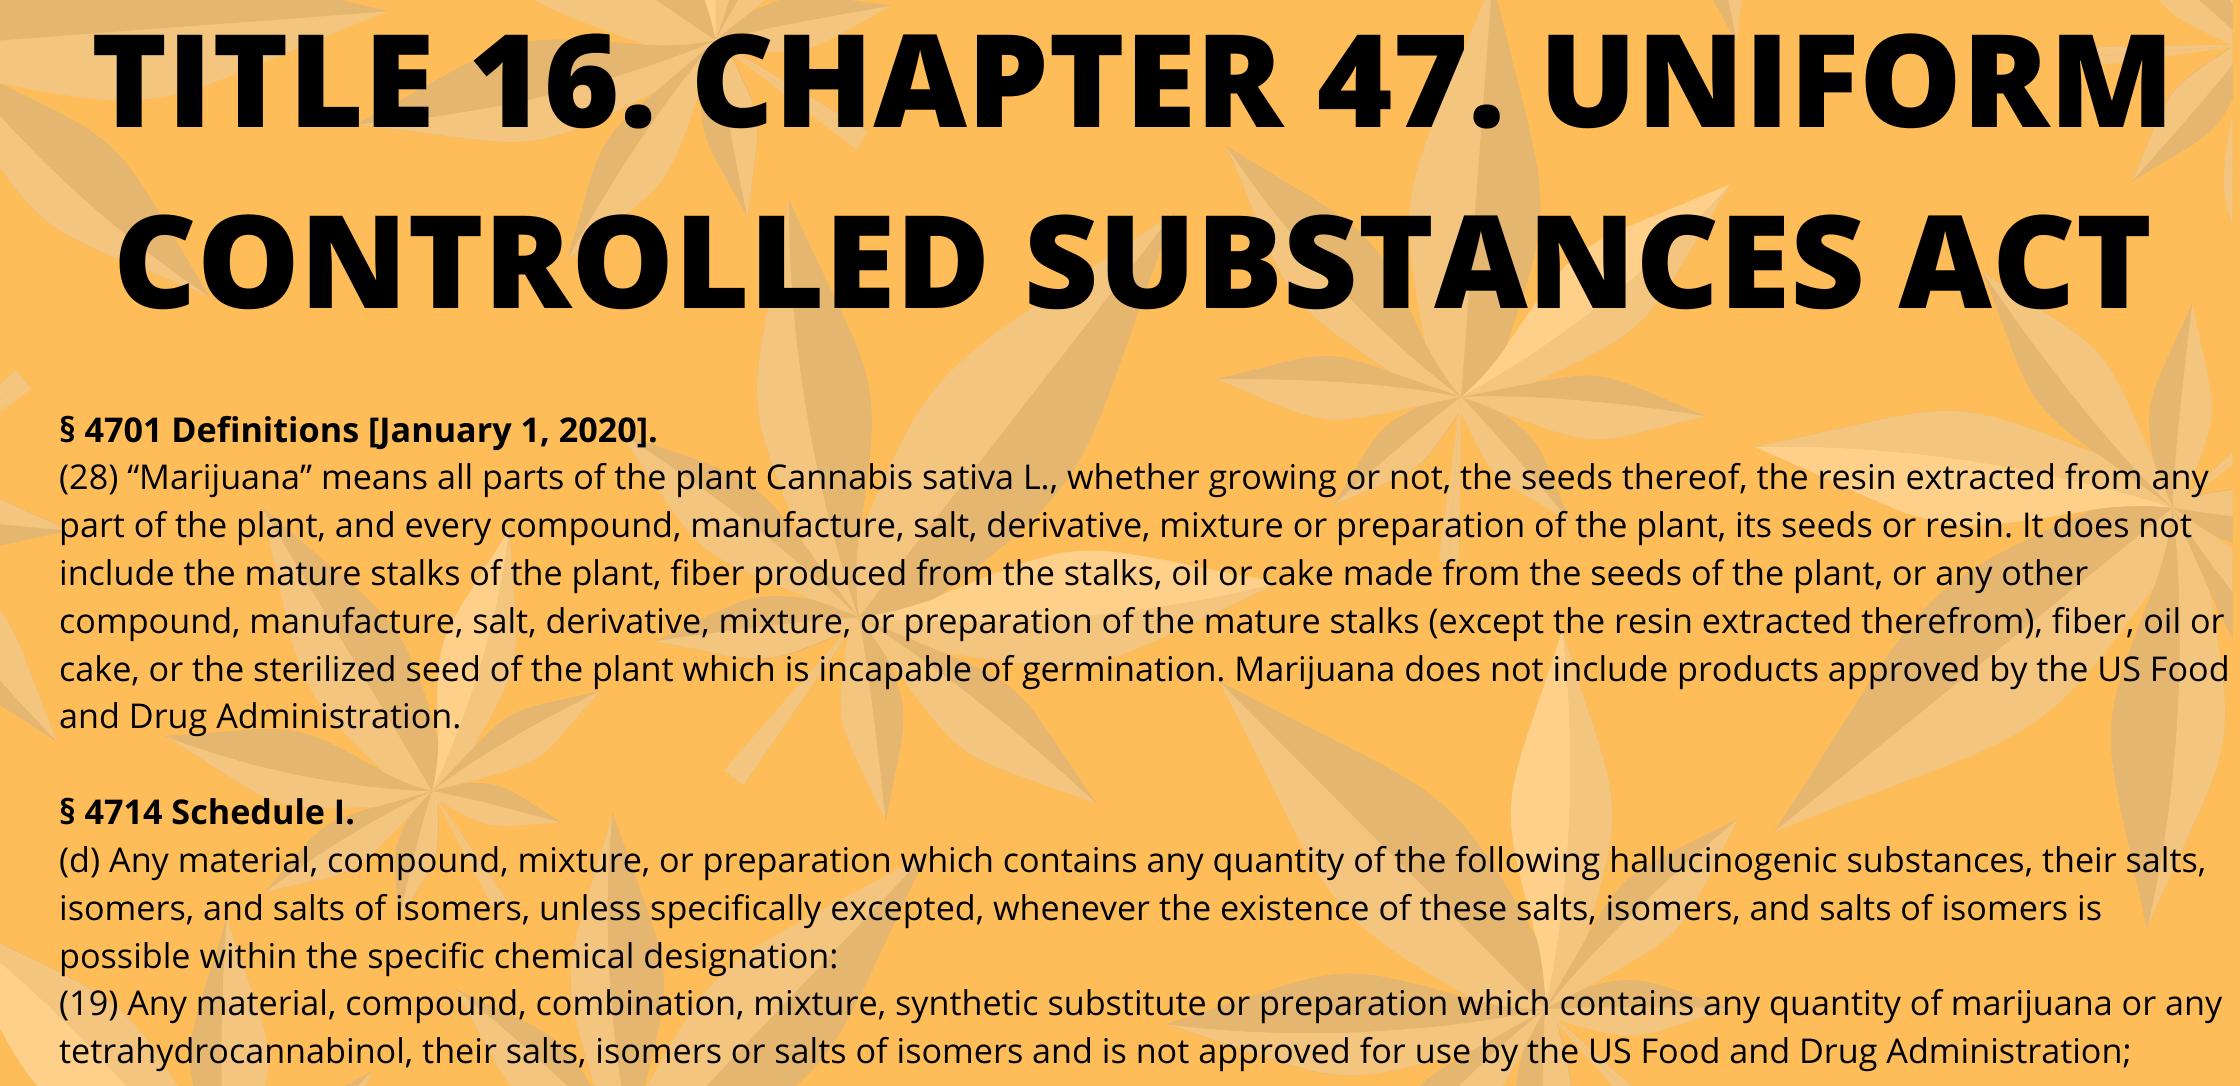 TITLE 16. CHAPTER 47. UNIFORM CONTROLLED SUBSTANCES ACT